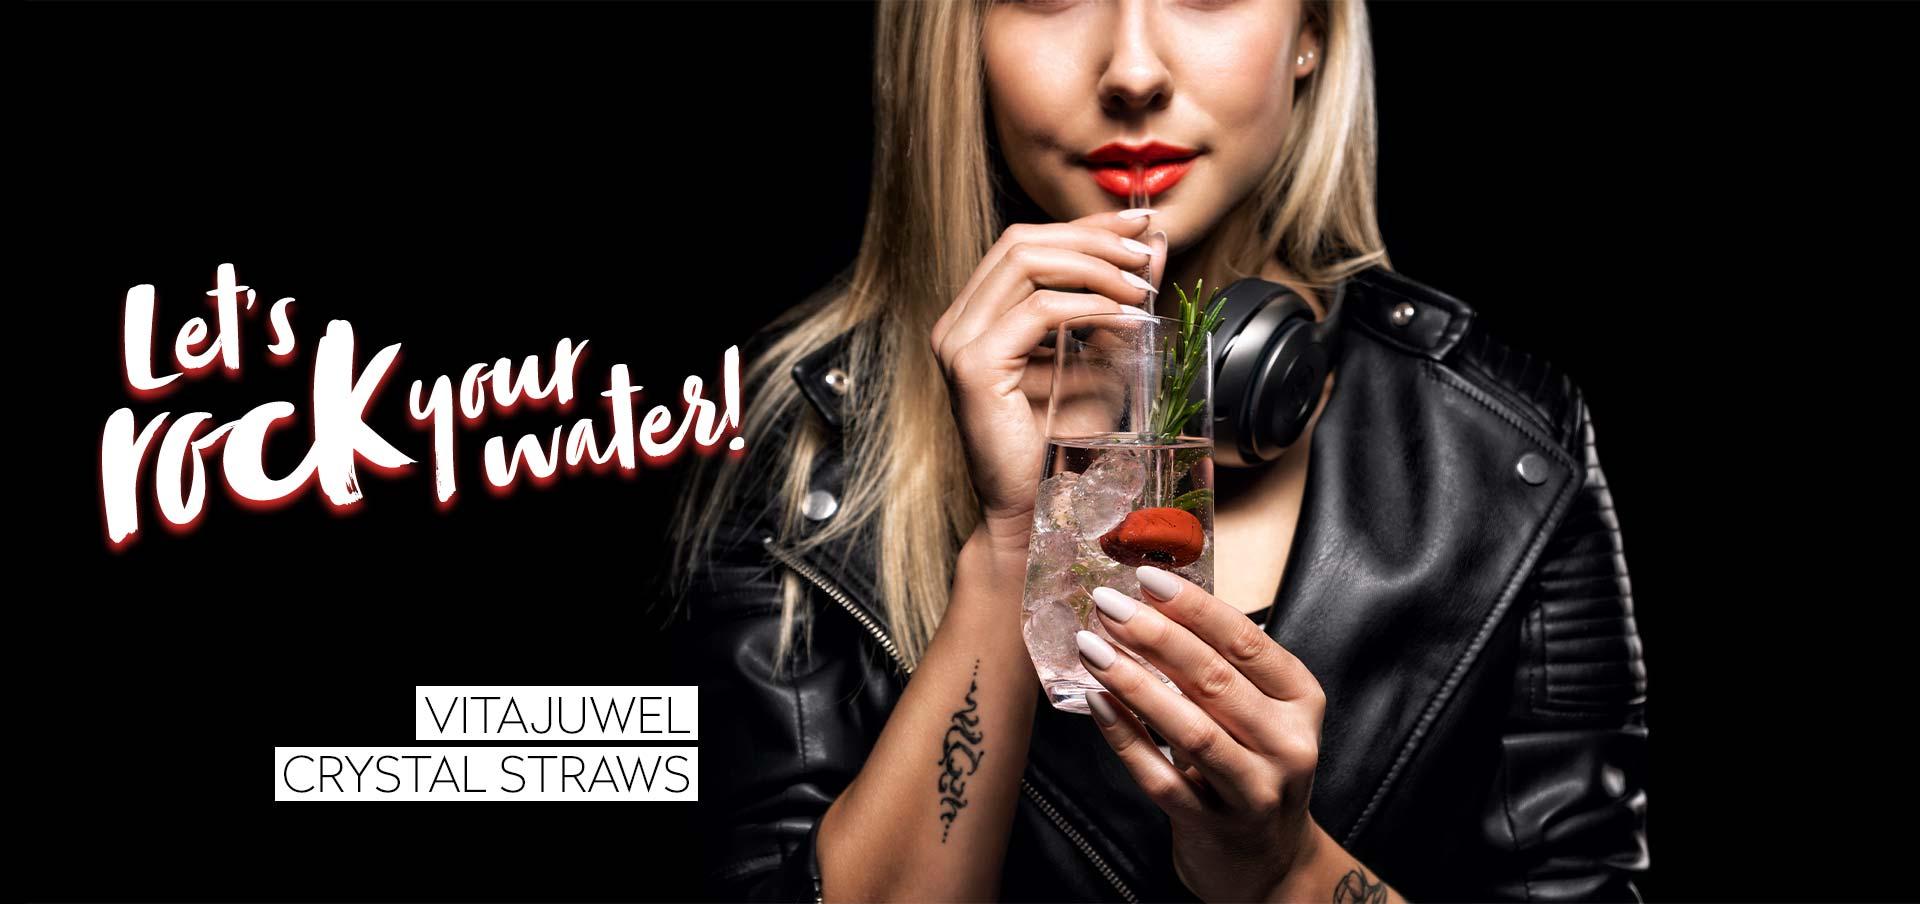 vitajuwel crystal straws glass straw let's rock your water